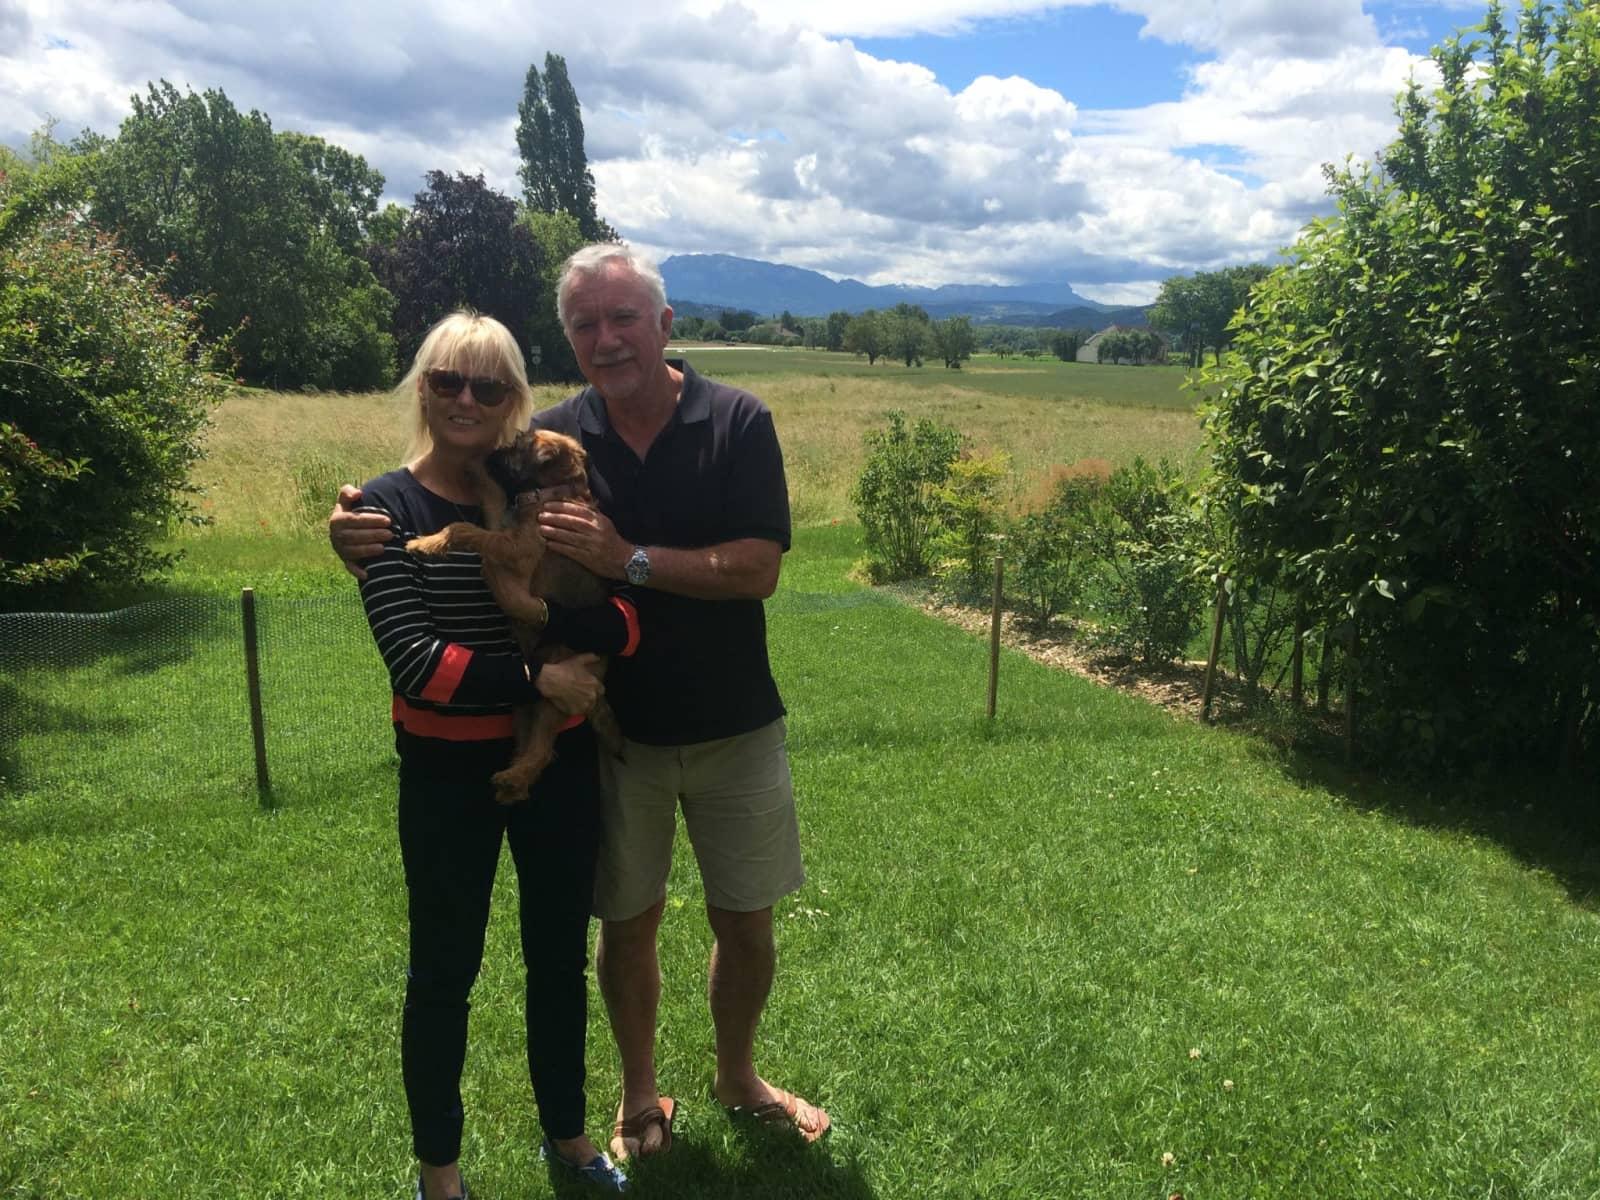 Linda & Norman from Martinborough, New Zealand